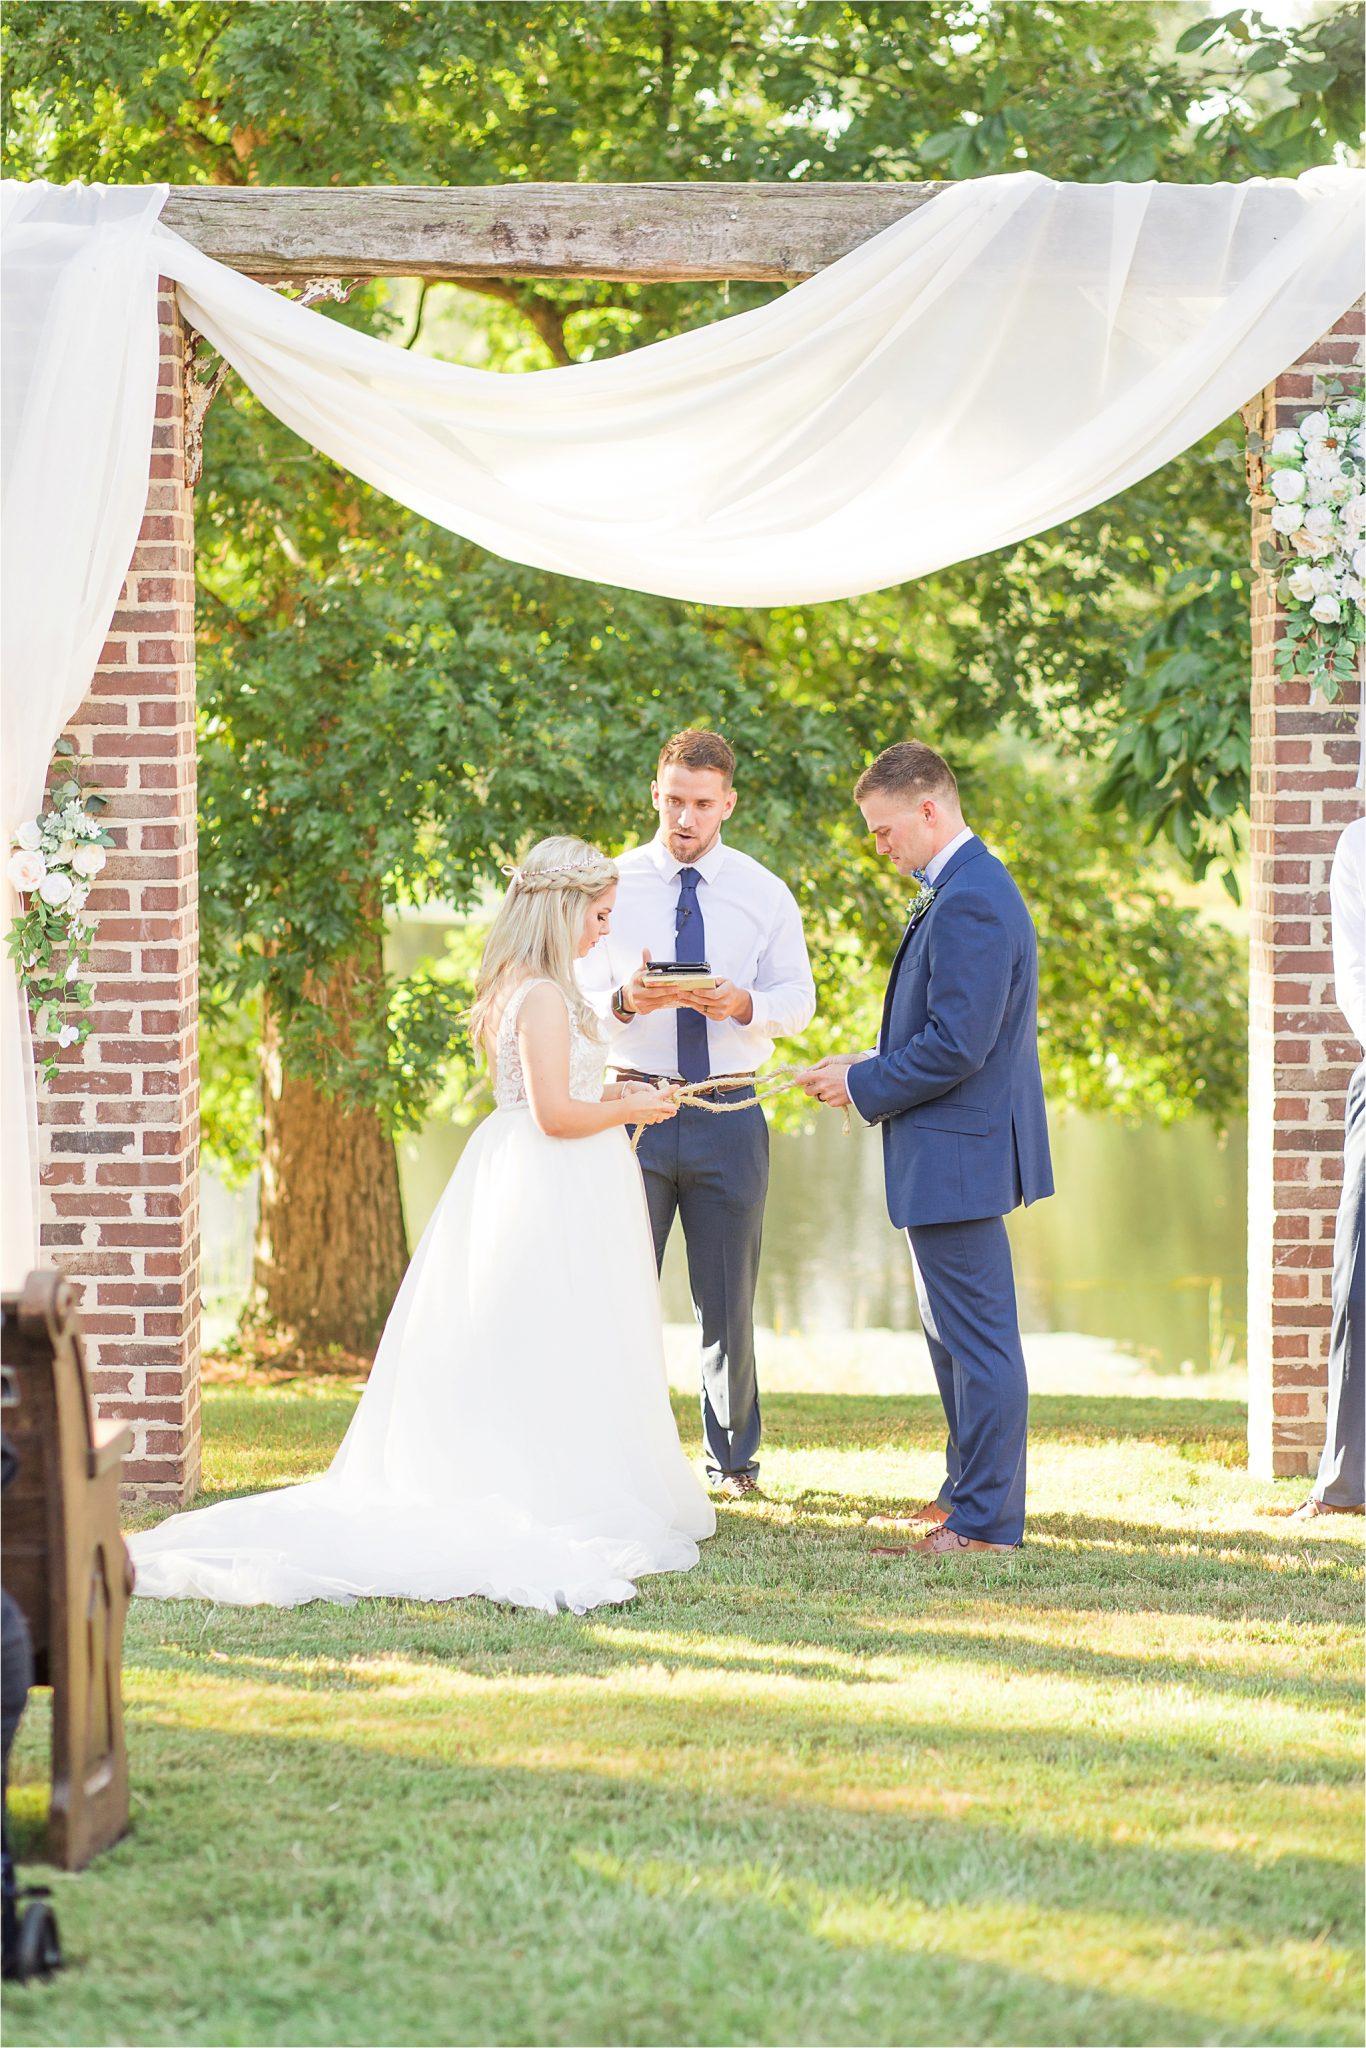 wedding-ceremony-alabama-wedding-photographer-blue-navy-vows-ceremonial-rope